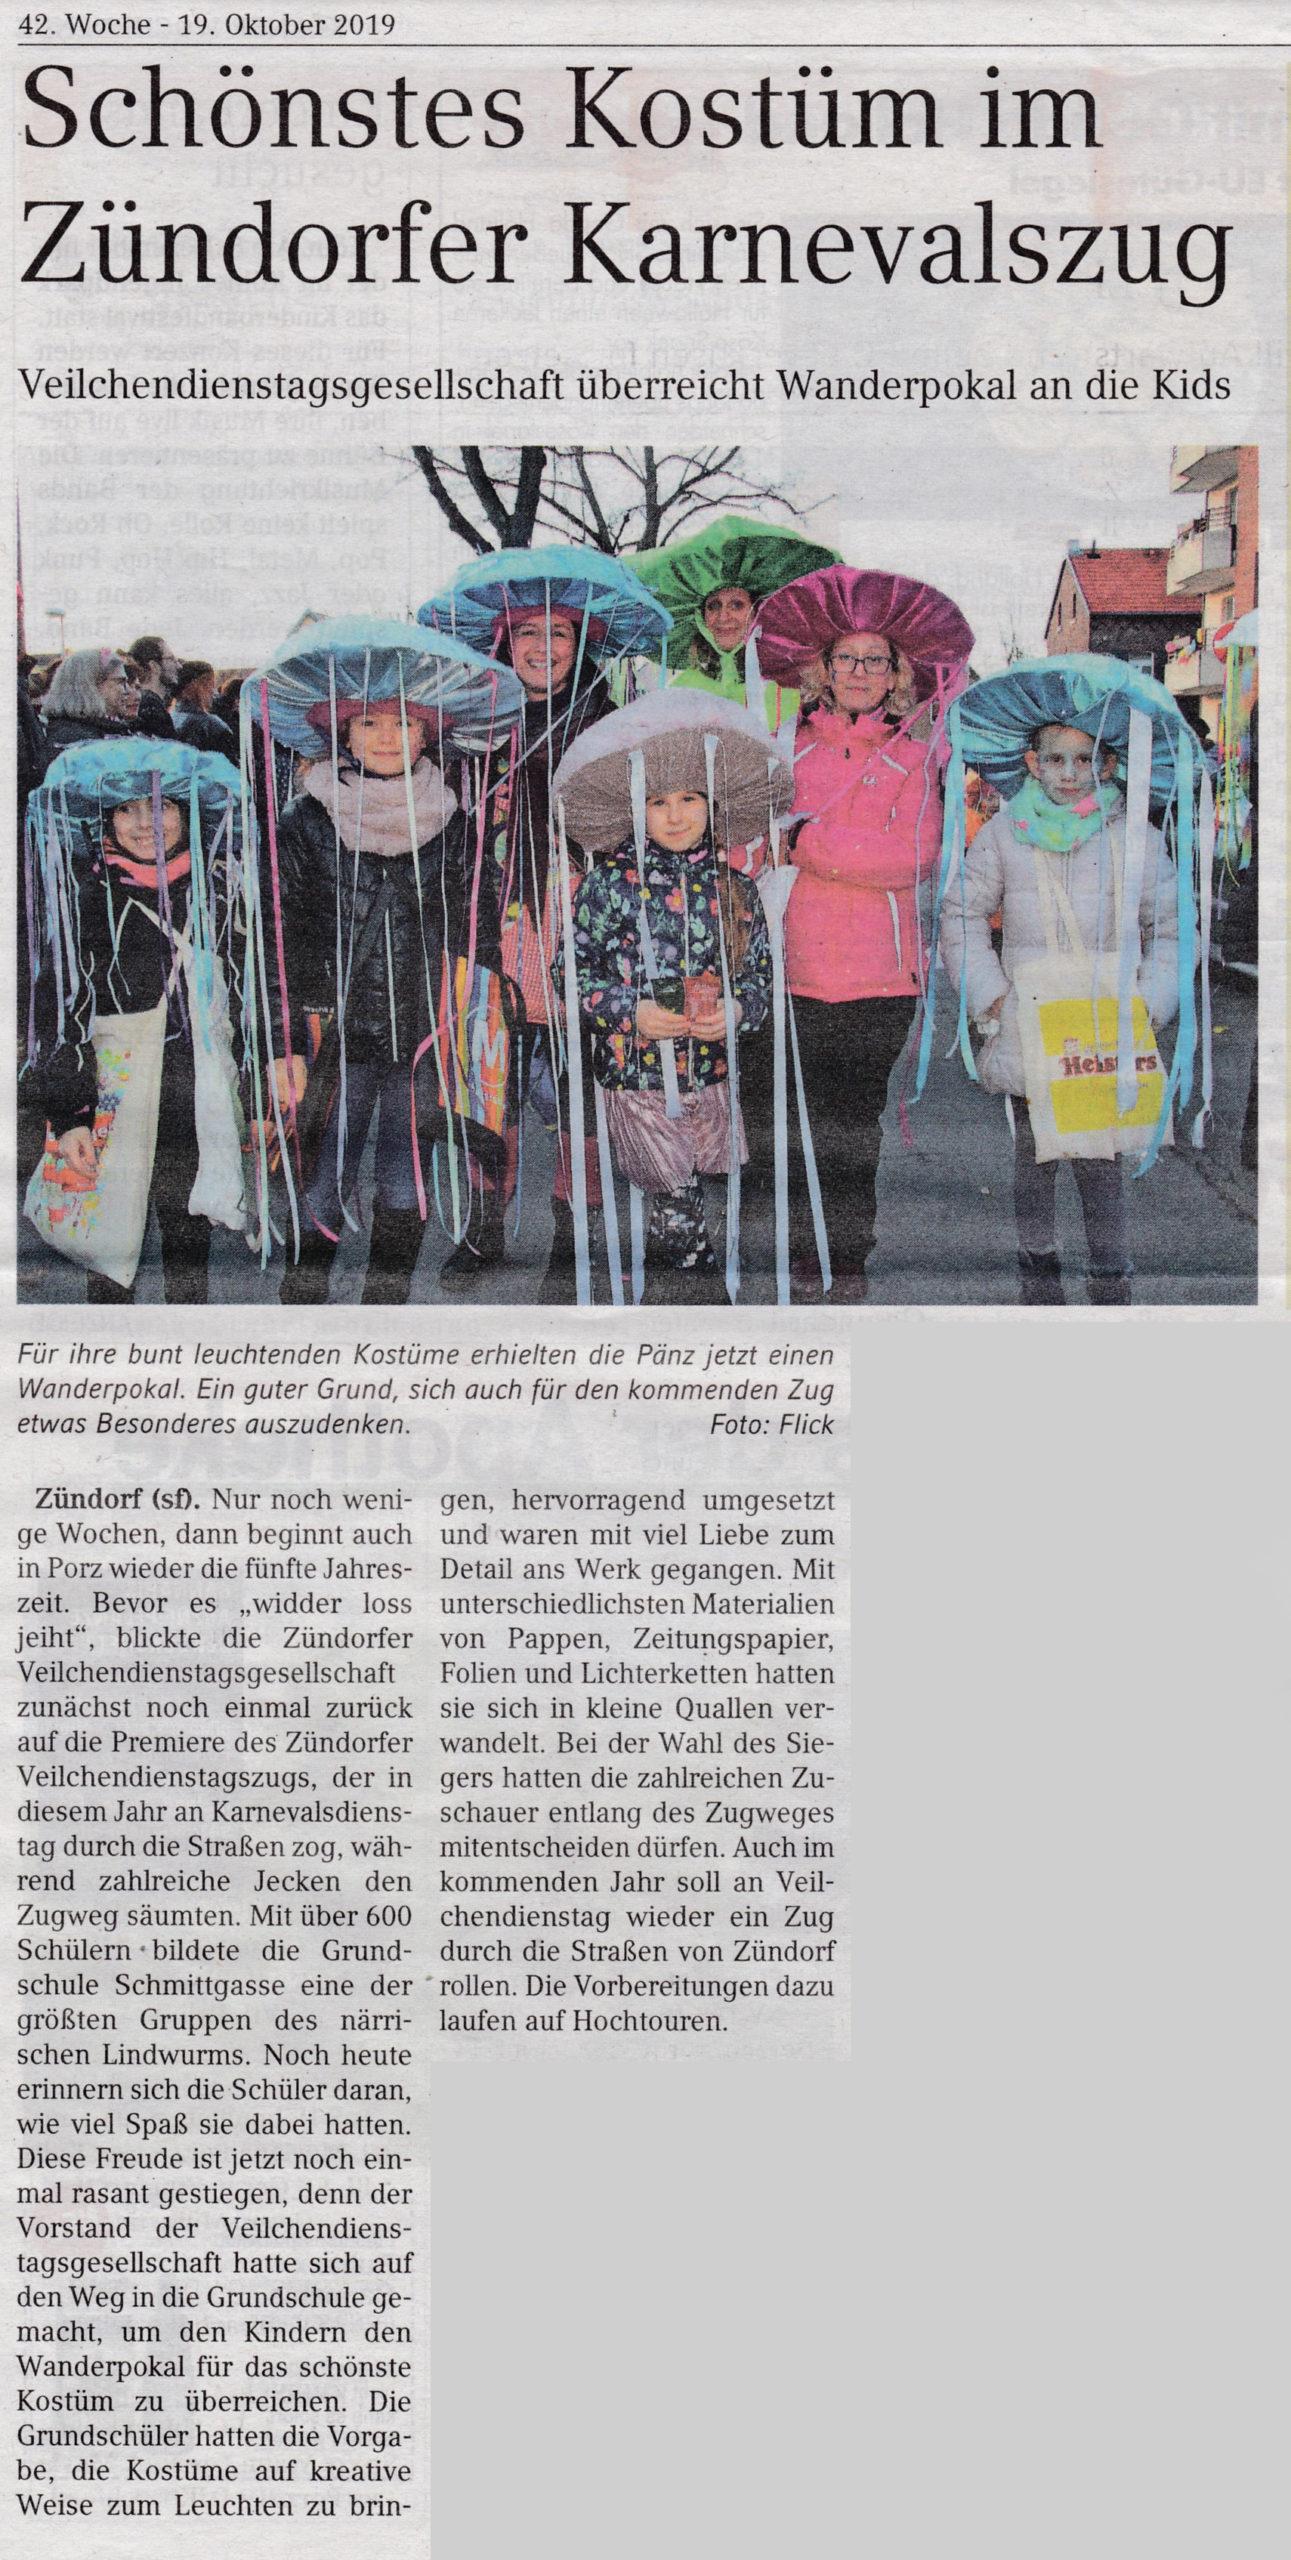 19.10.2019 Porz aktuell